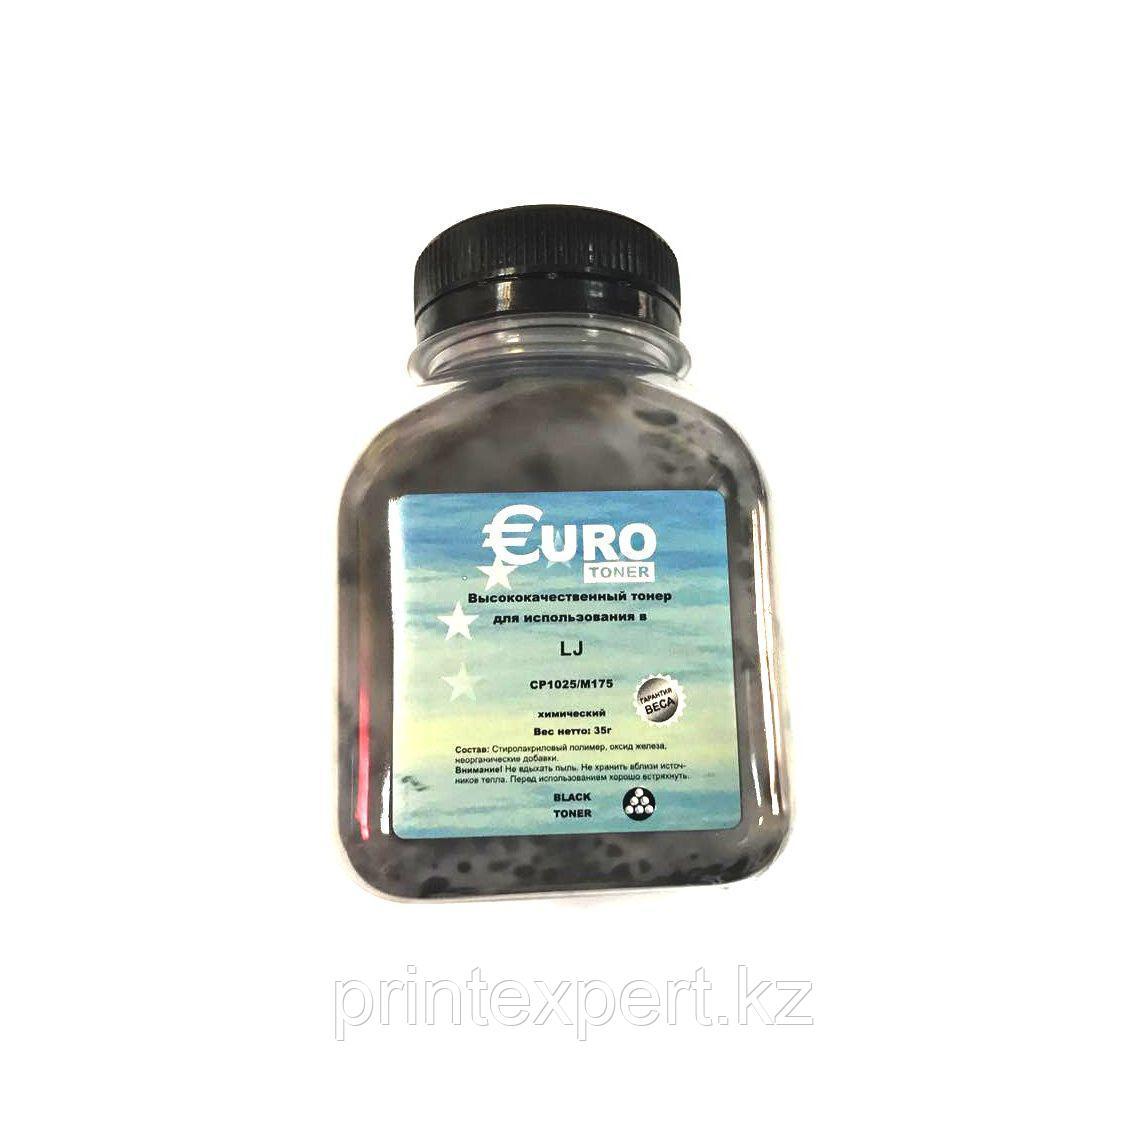 Тонер EURO TONER для HP CLJ CP2025 Universal Black химический (100 гр)